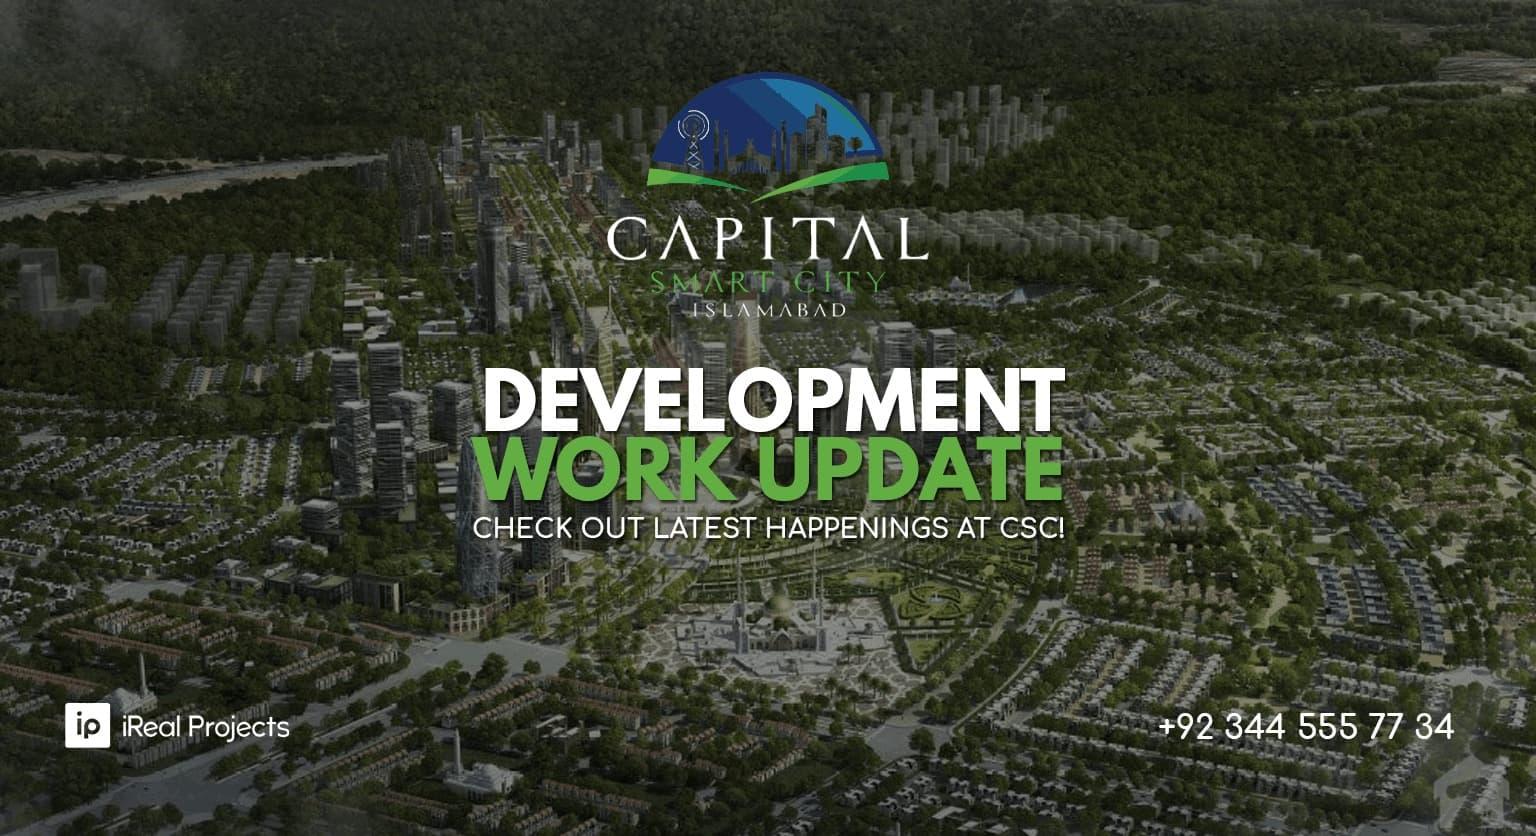 capital smart city latest development work updates